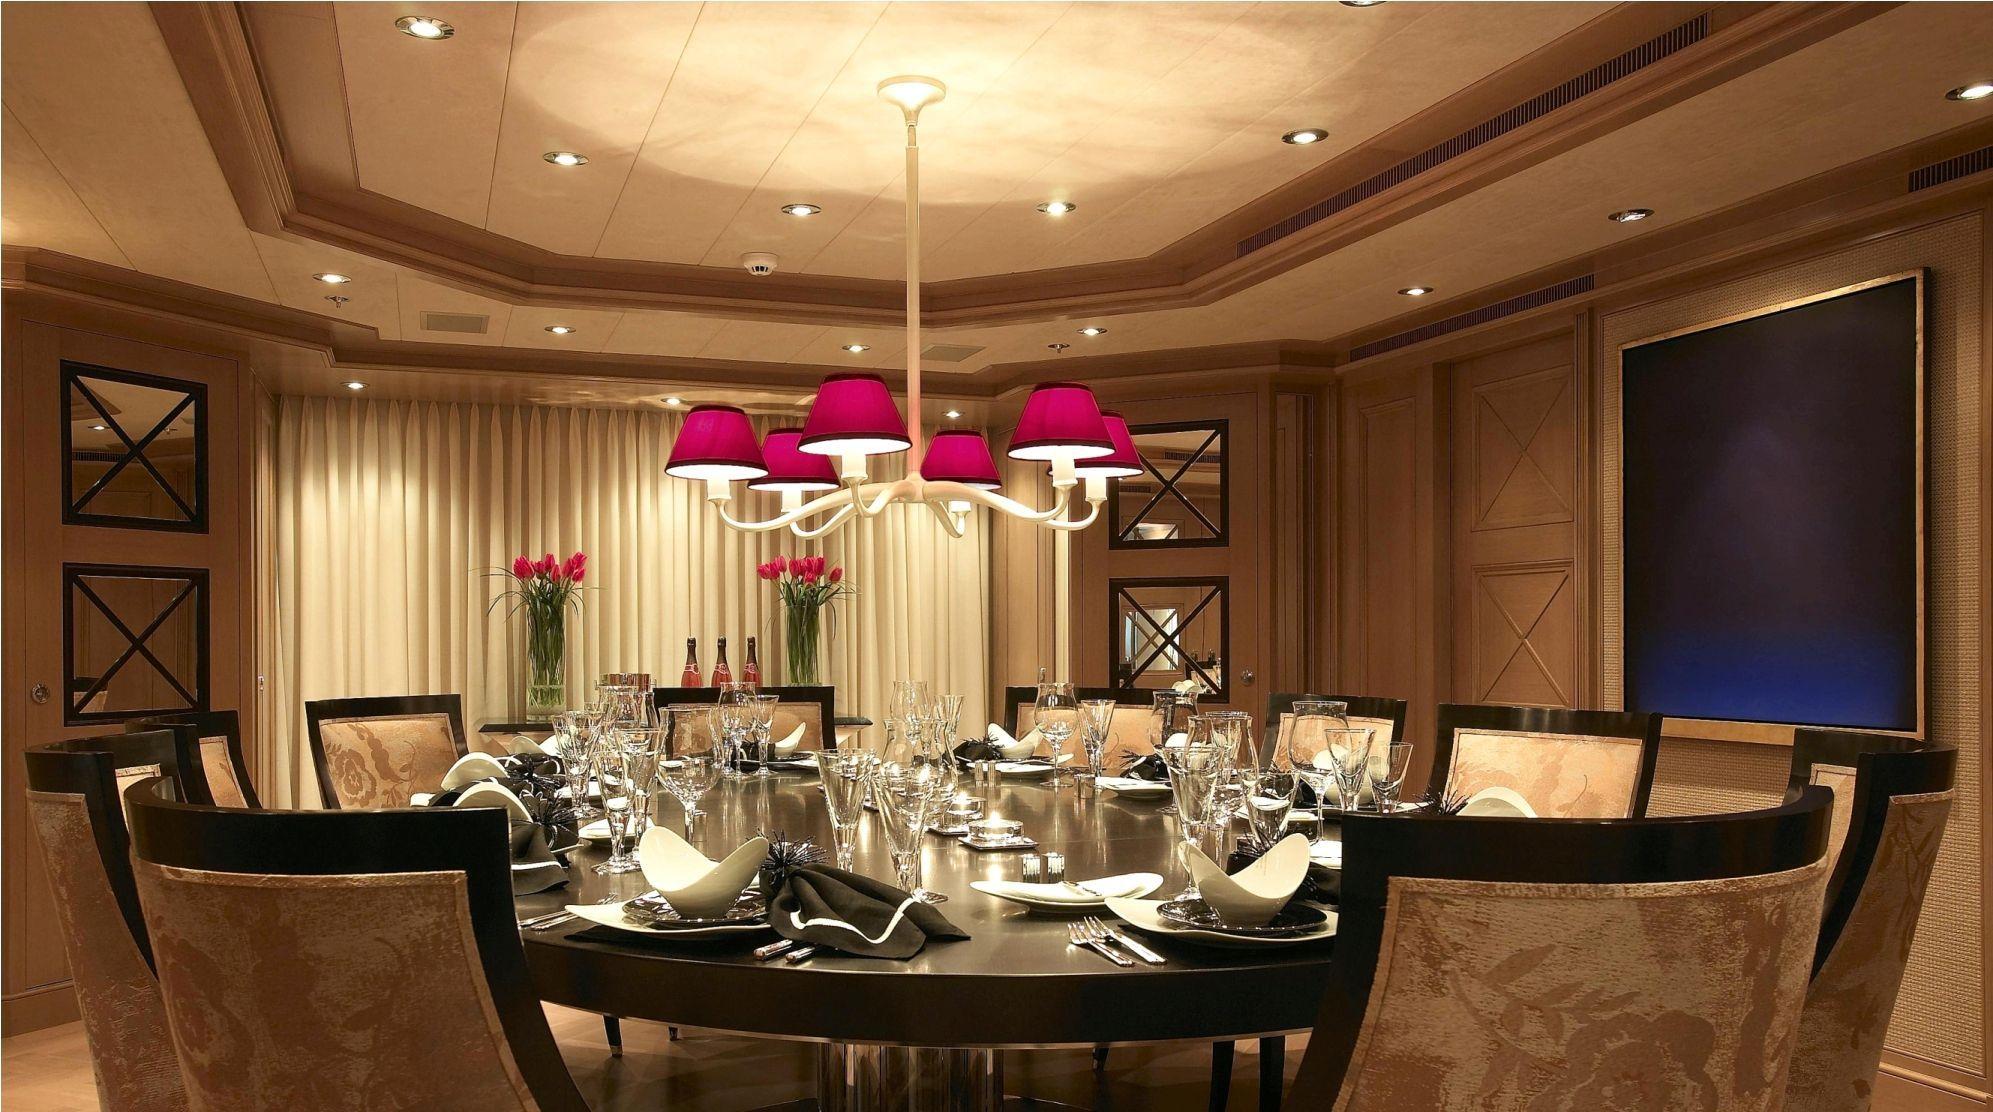 Elegant Dining Room Chandeliers Pleasing Dining Room Urban Dining Room Lighting Ultra Modern Dining Room Design Decoration